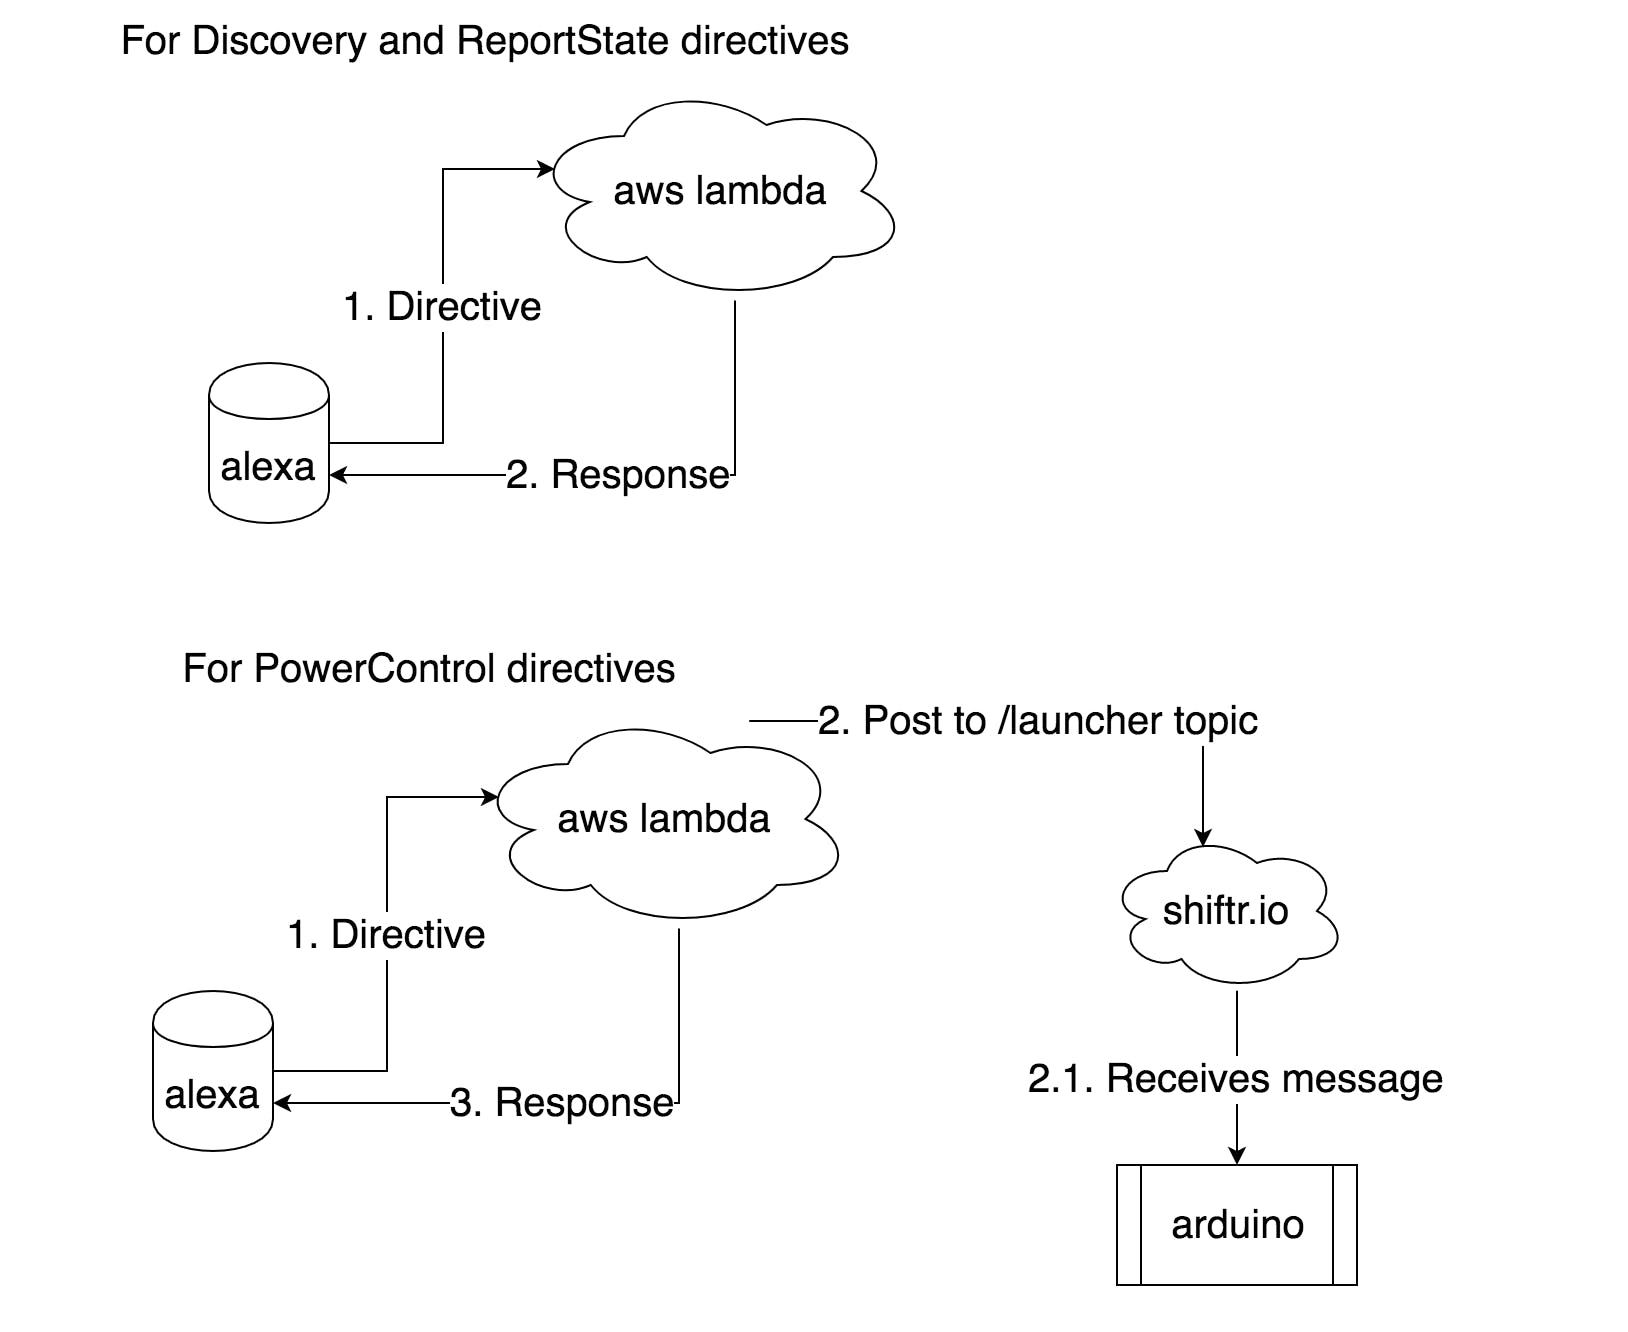 When receiving PowerControl directives we send a message to the Arduino through shiftr.io